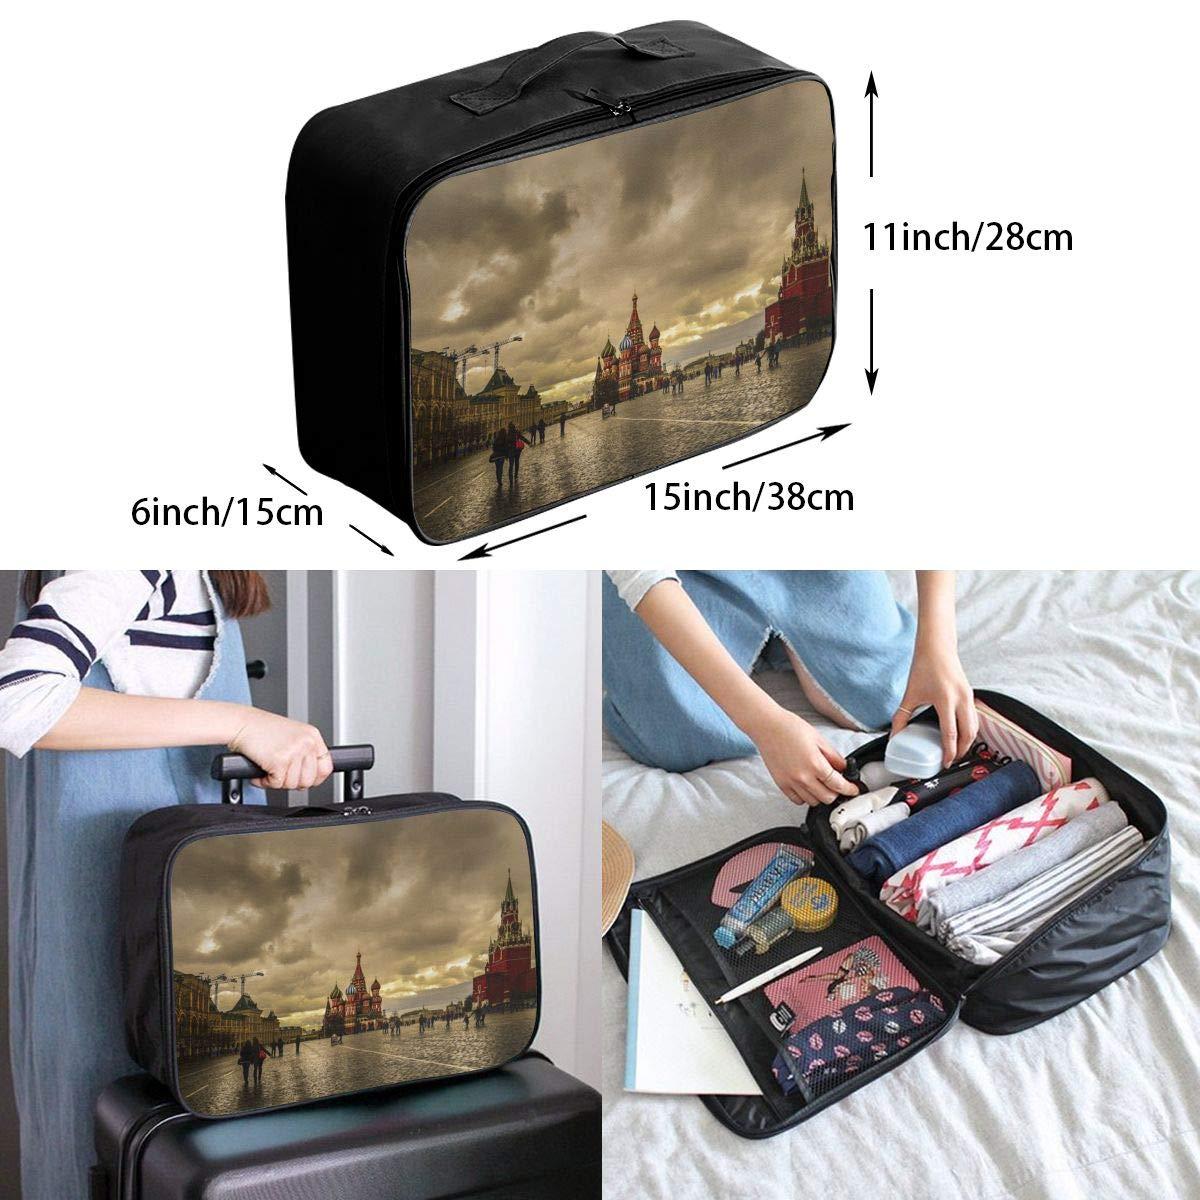 Travel Luggage Duffle Bag Lightweight Portable Handbag Red Square Pattern Large Capacity Waterproof Foldable Storage Tote